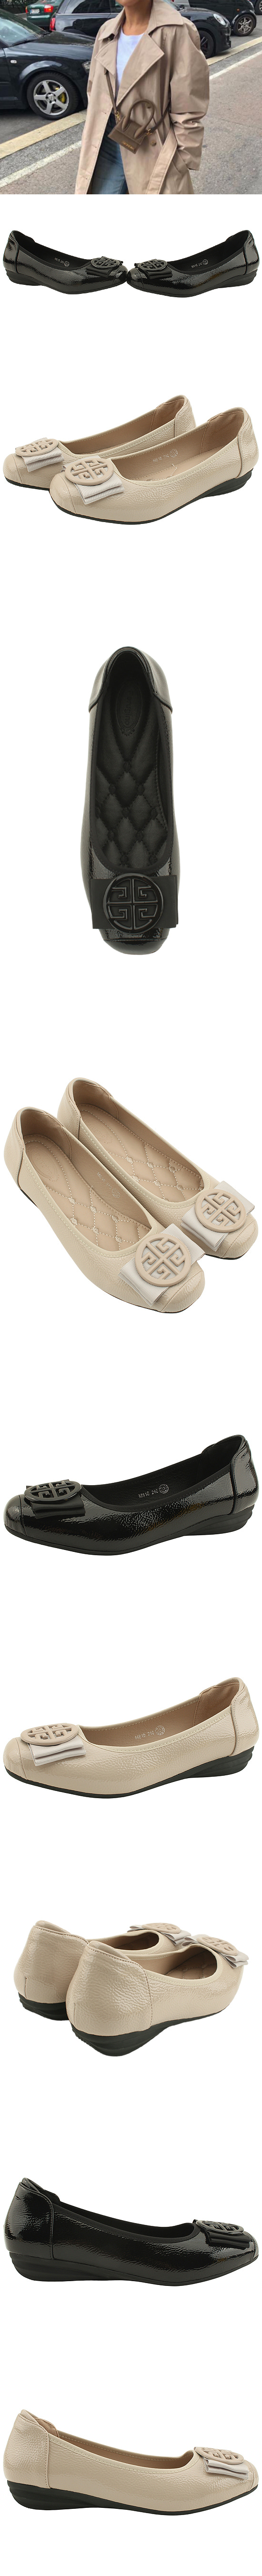 Feminine Ribbon Wedge Heel Loafer Shoes Beige